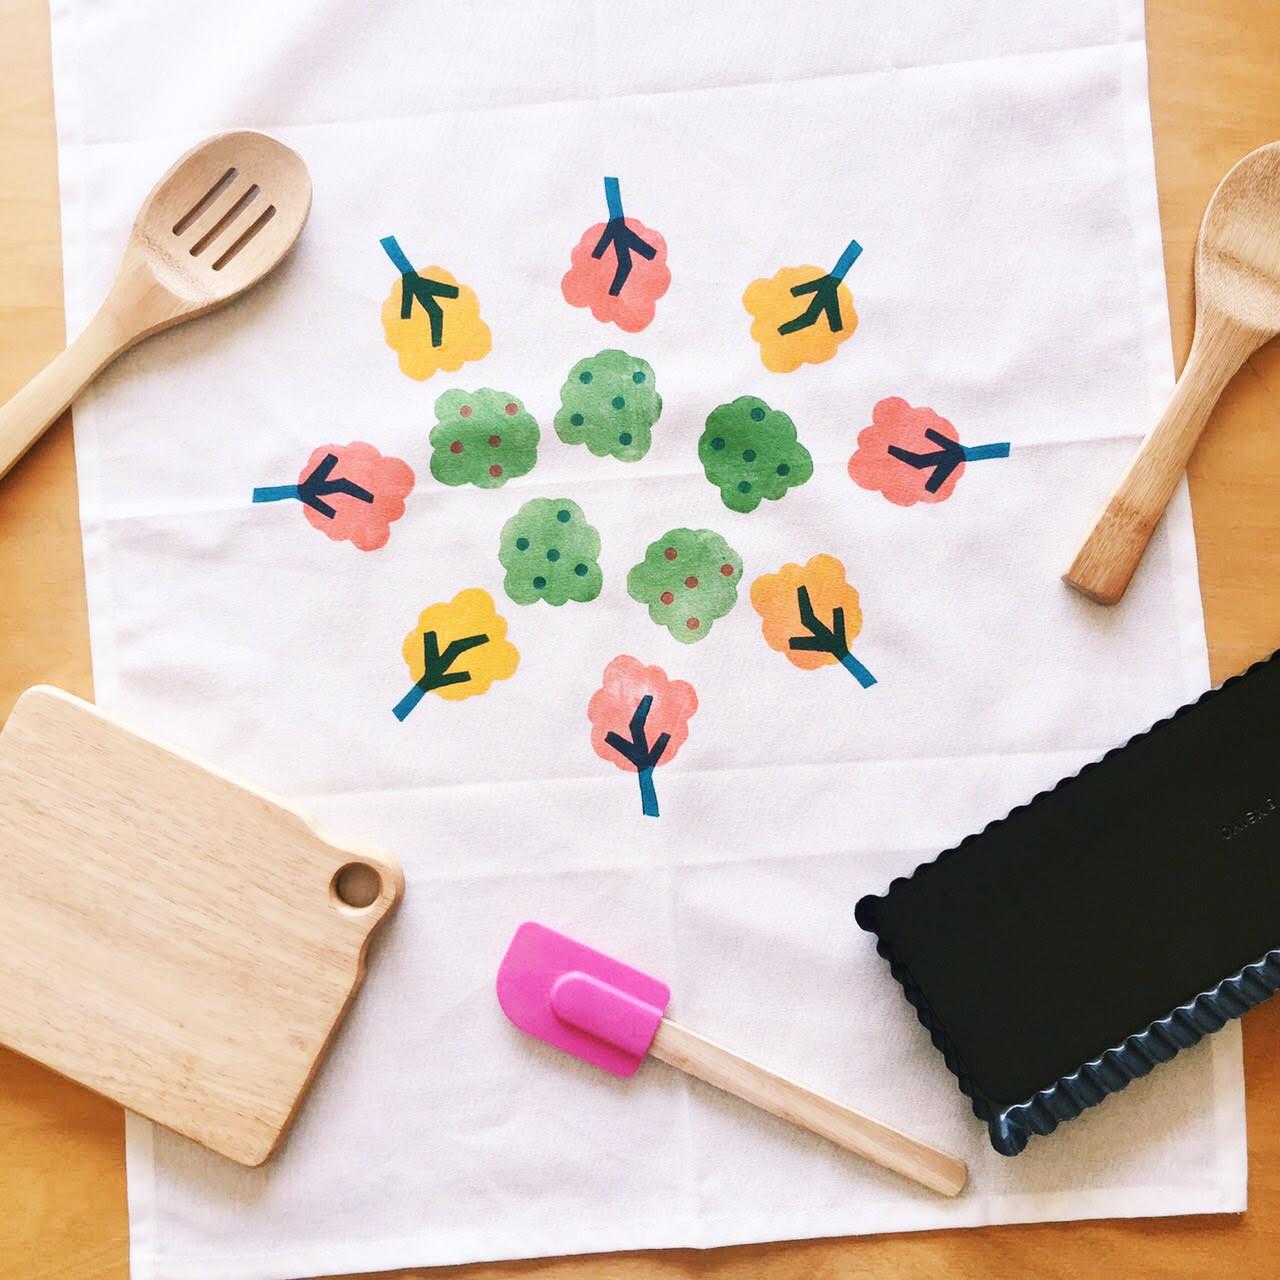 Block Printed Tea Towel Workshop, craft workshop - The Corner Store Gallery, Orange NSW, photograph by Jacqueline Chan